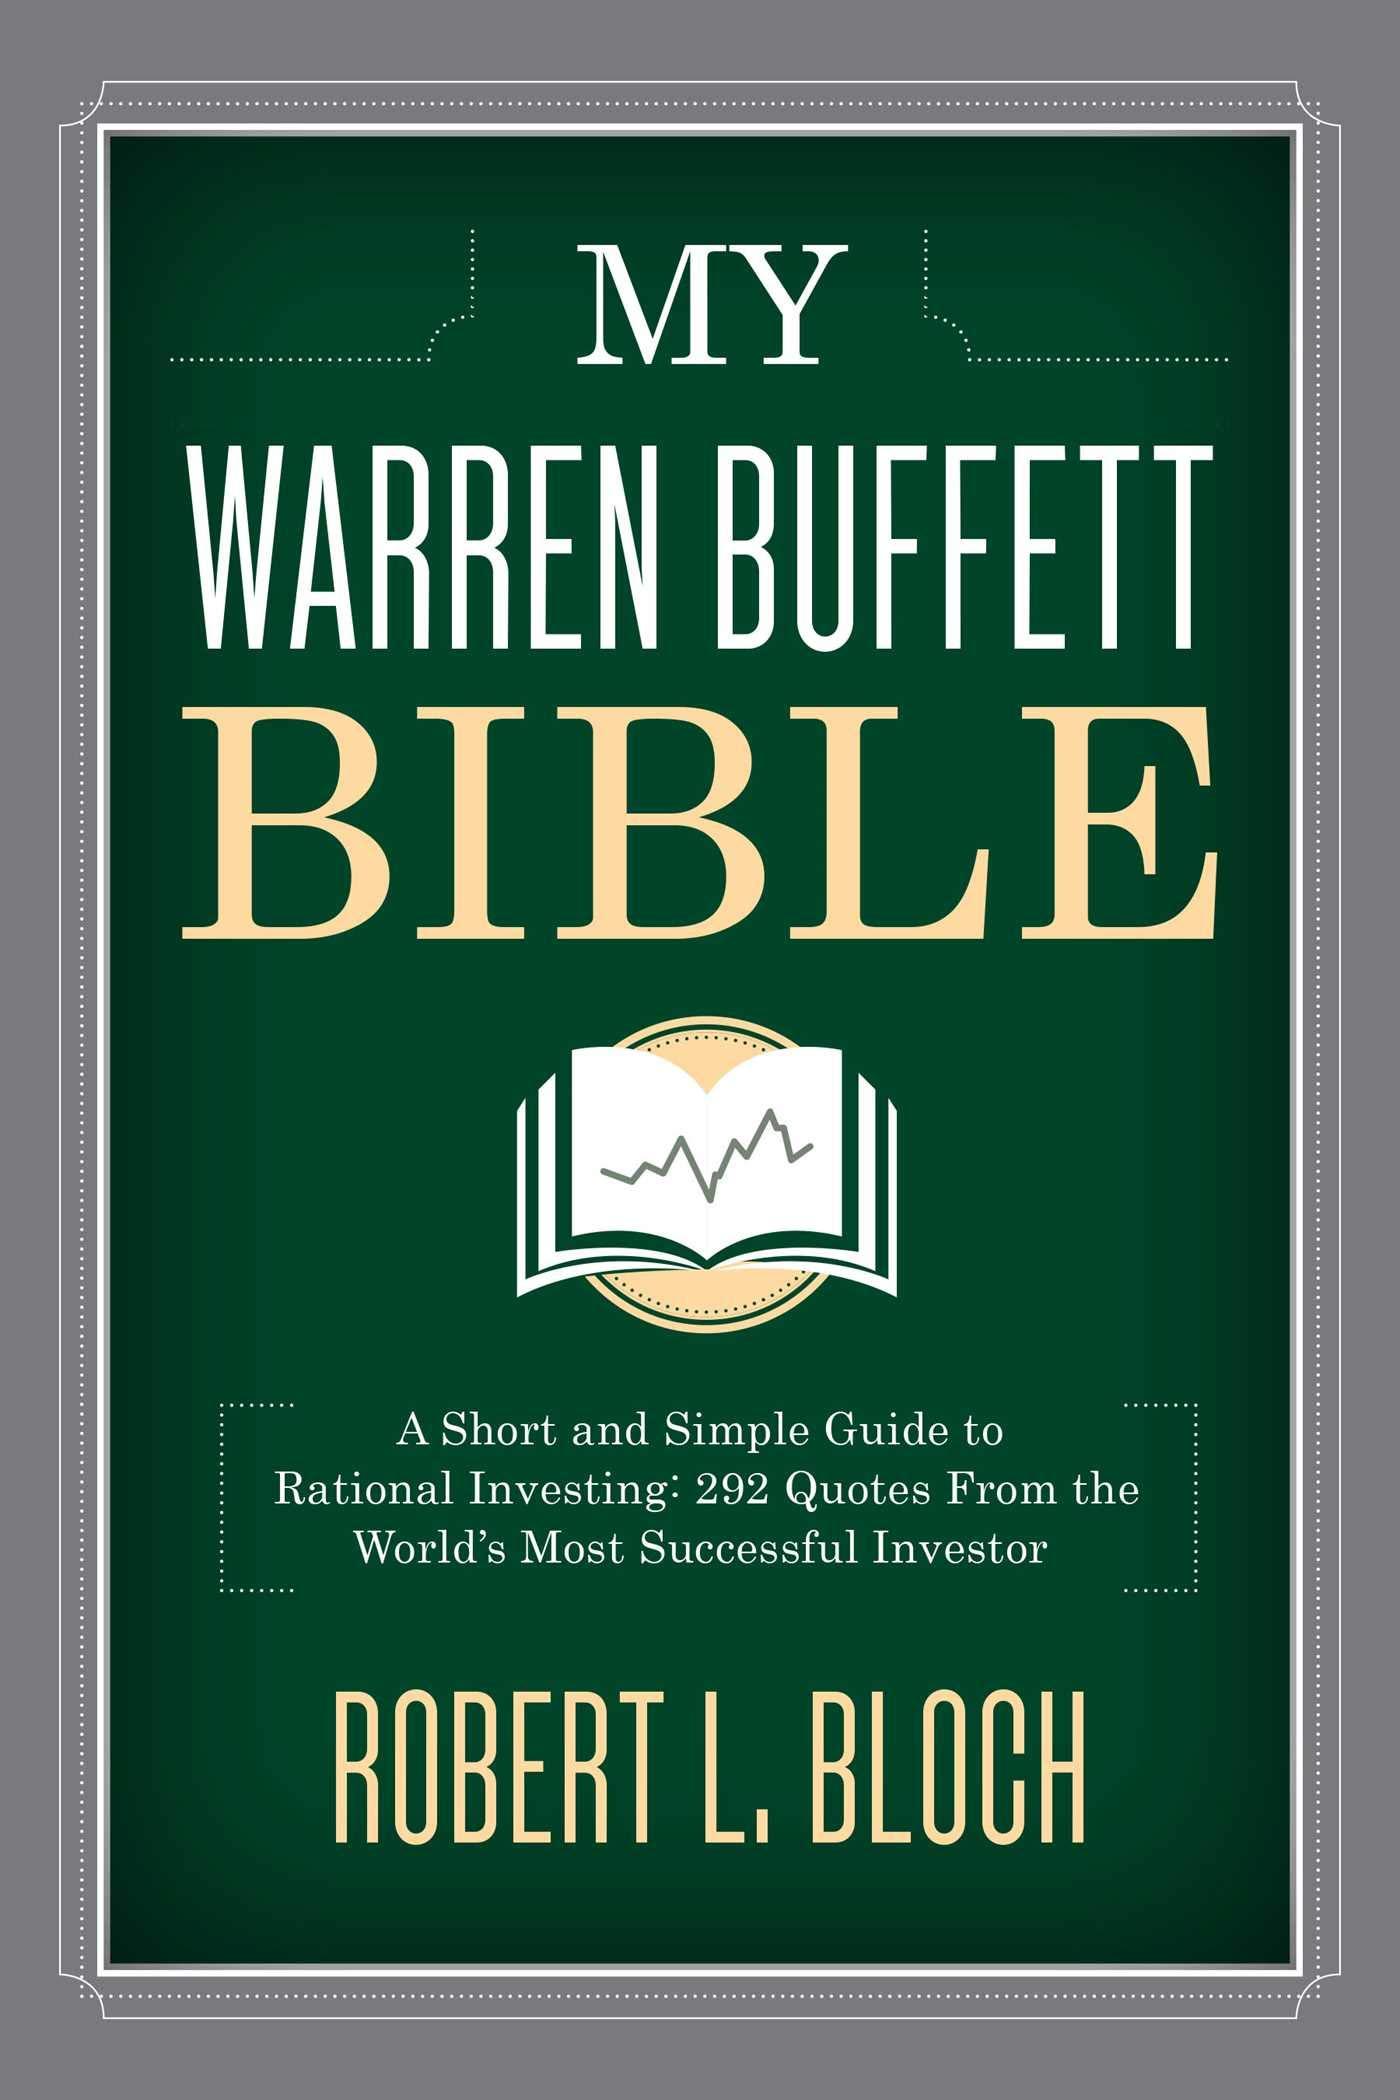 Amazon.com: My Warren Buffett Bible: A Short and Simple ...